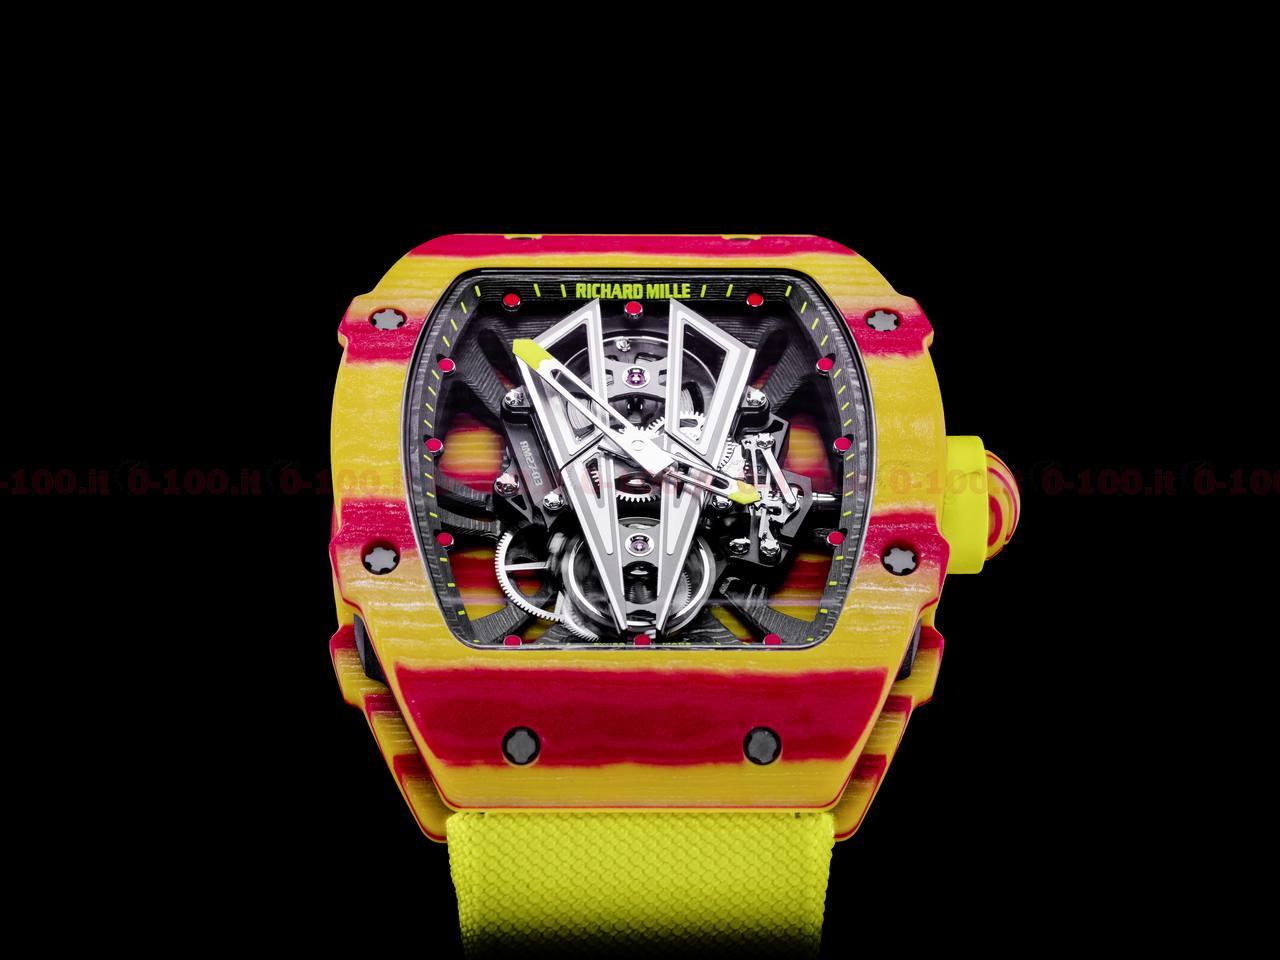 Richard Mille RM 27-03 Limited Edition_prezzo_price_0-1002